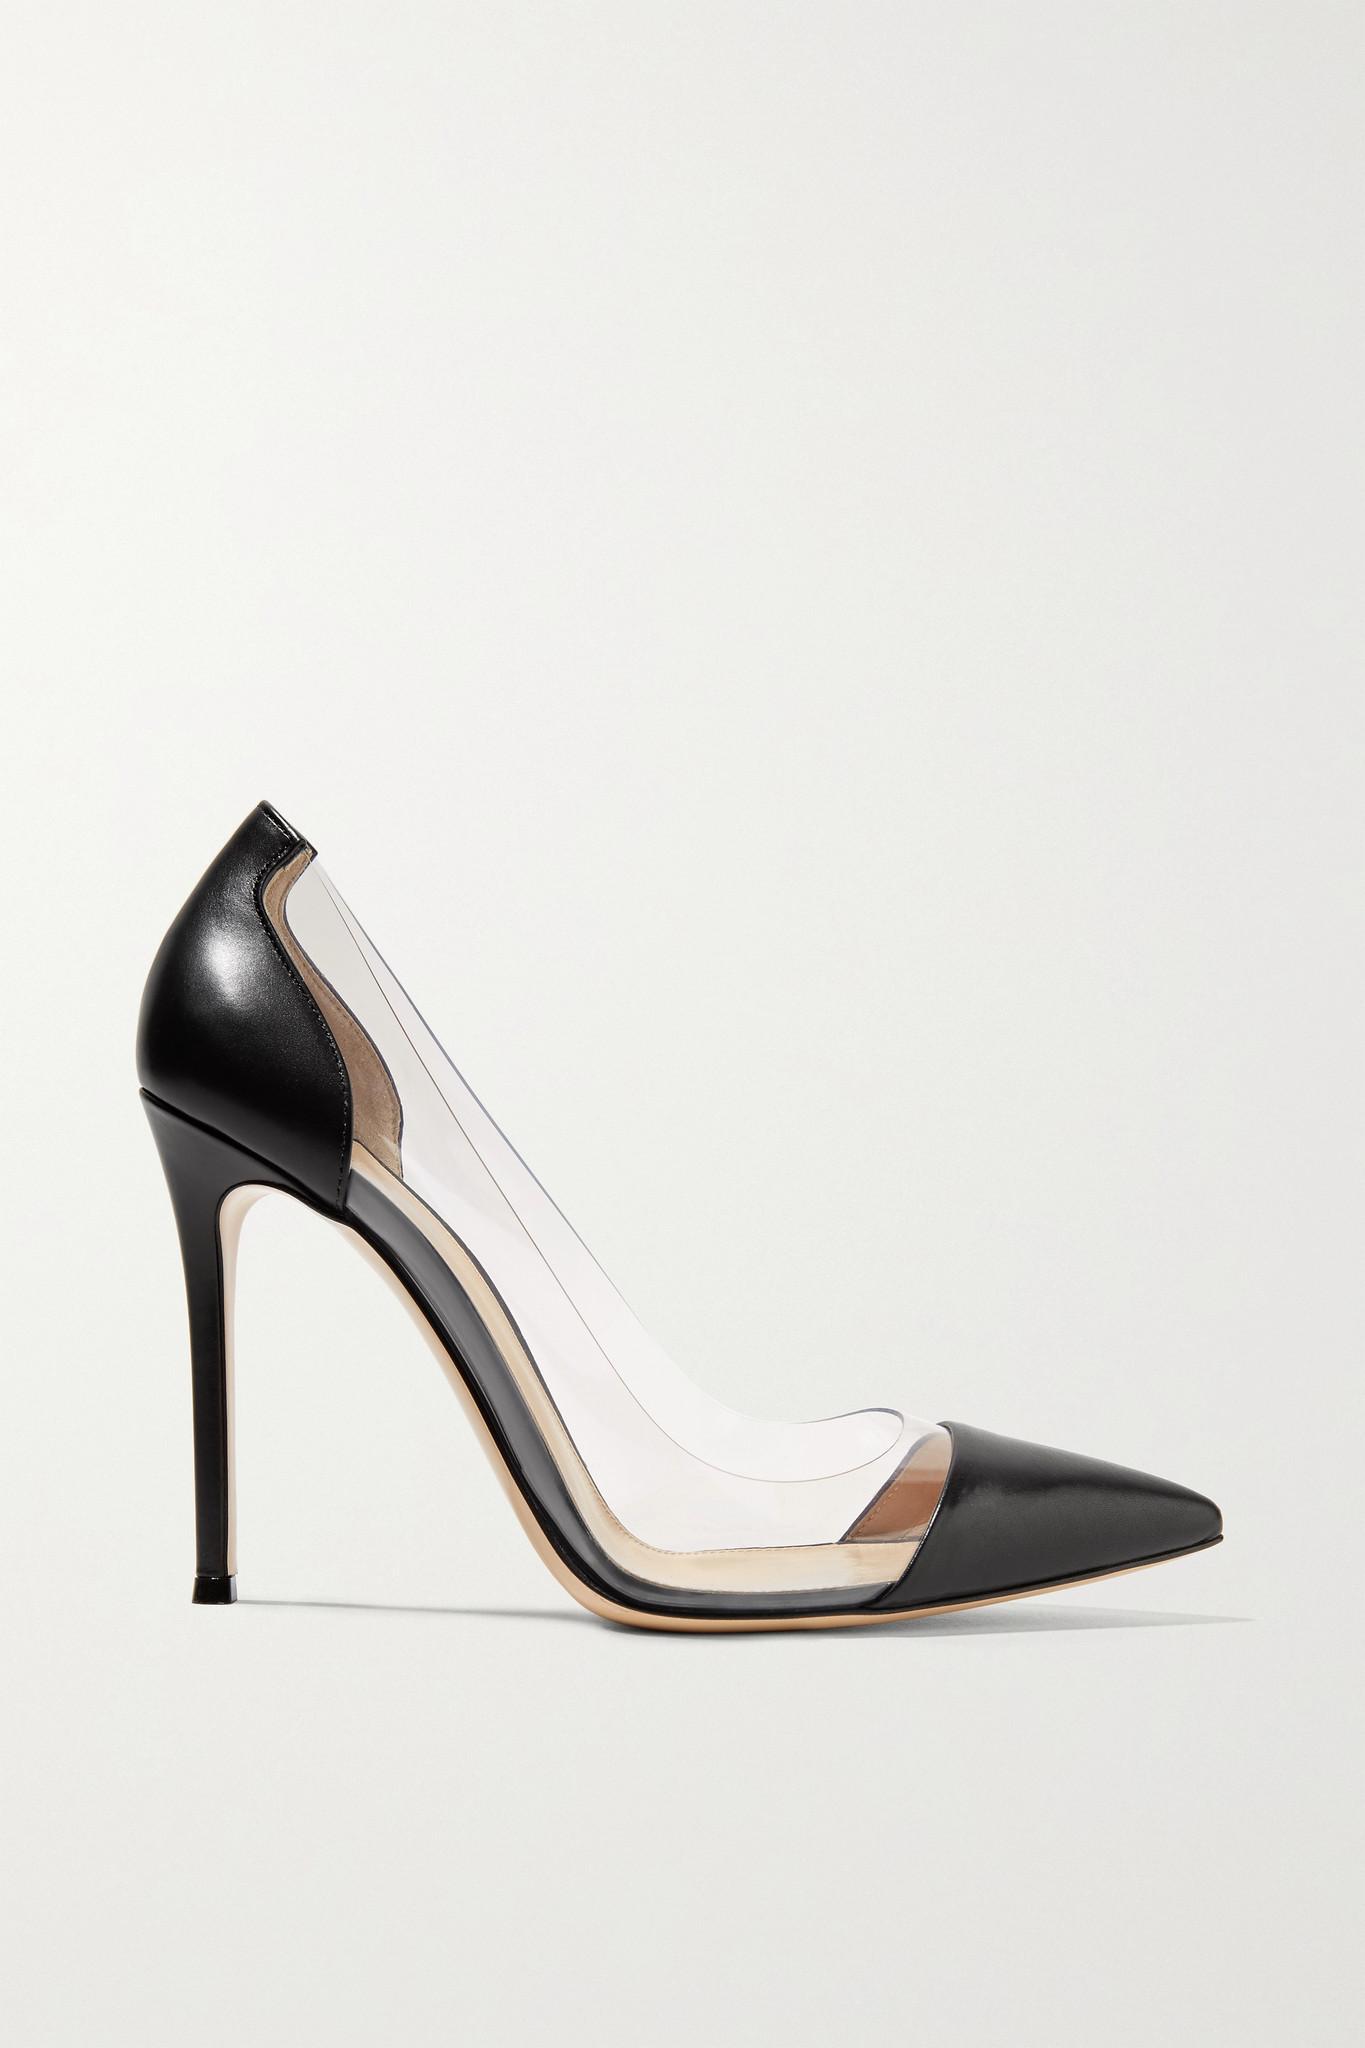 GIANVITO ROSSI - Plexi 100 皮革 Pvc 高跟鞋 - 黑色 - IT34